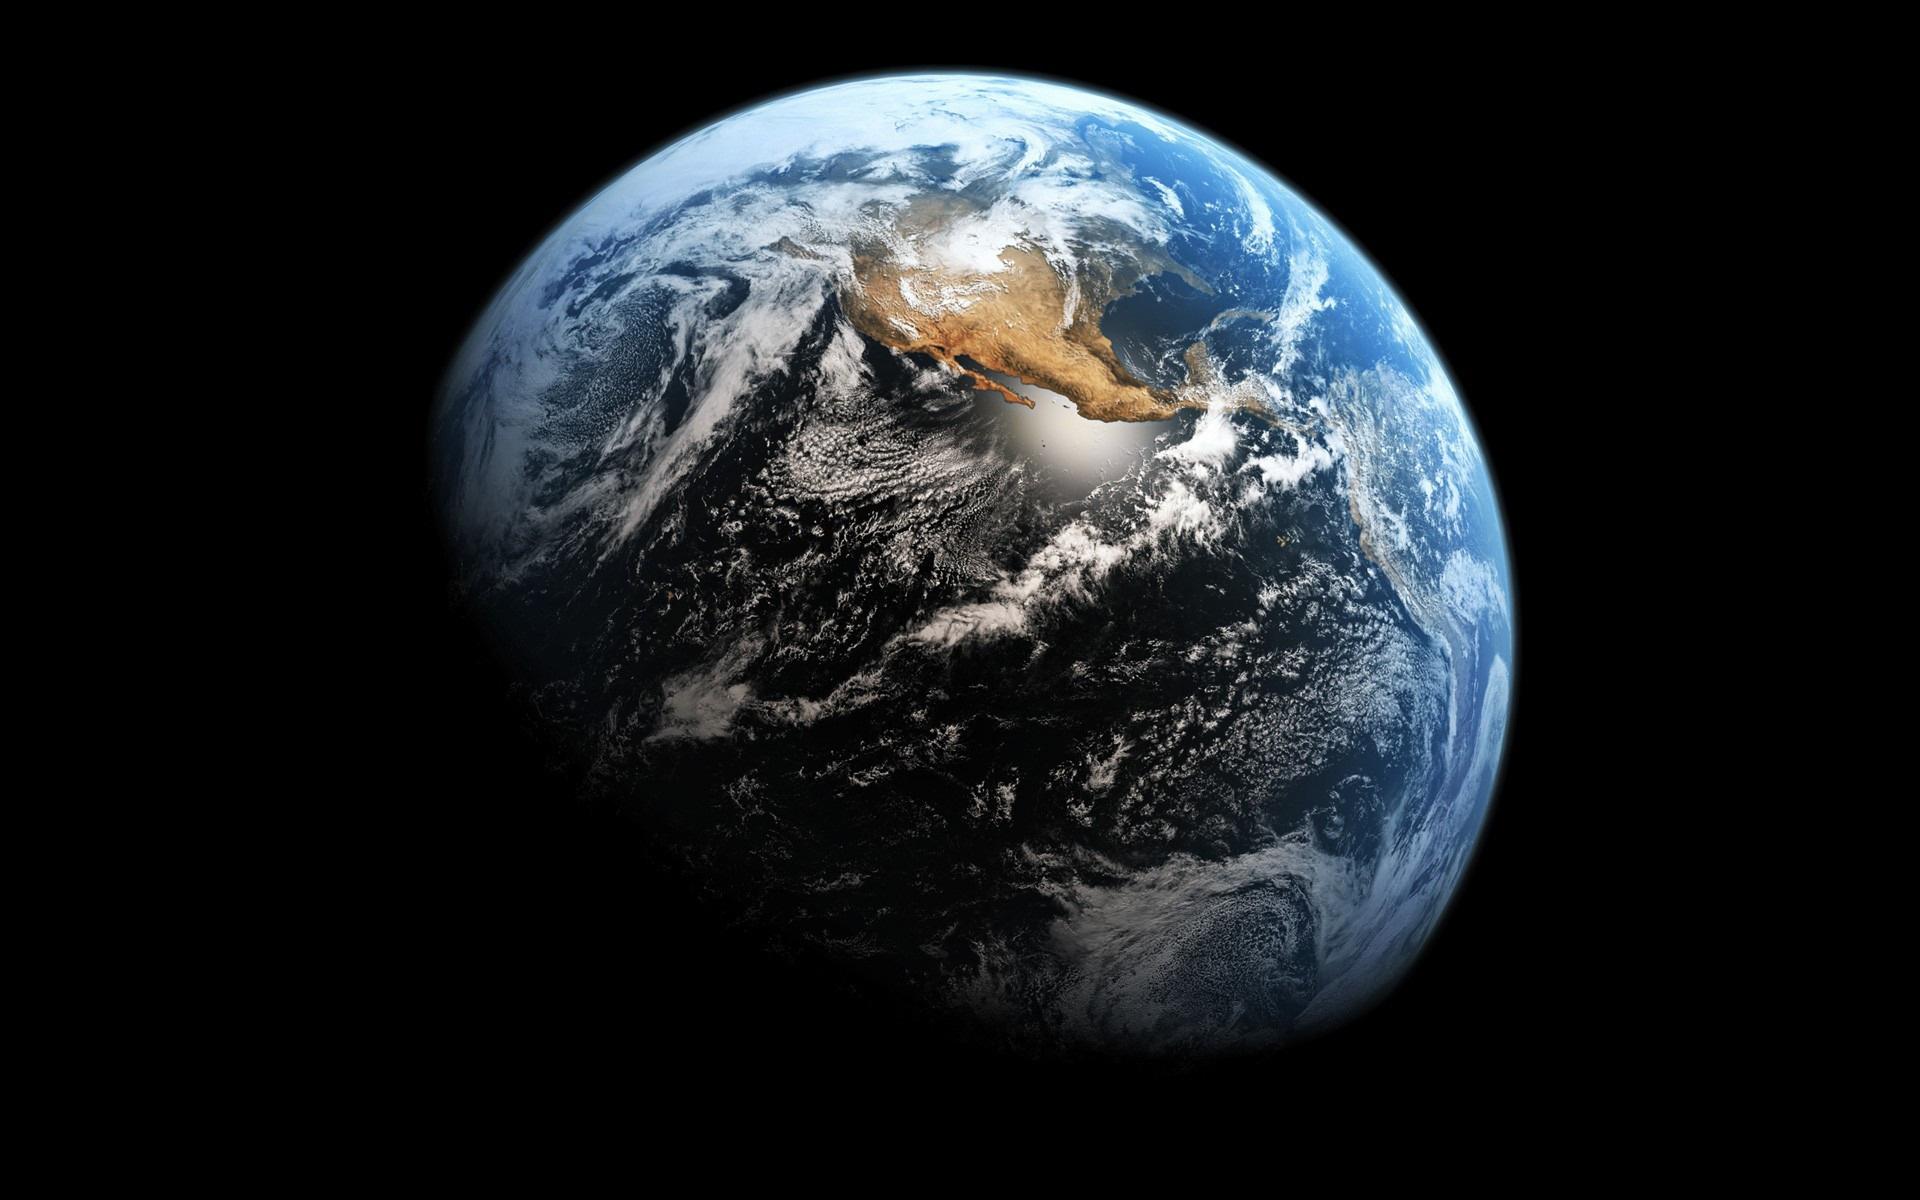 Erde Wallpaper Unsere Erde Hintergrundbilder